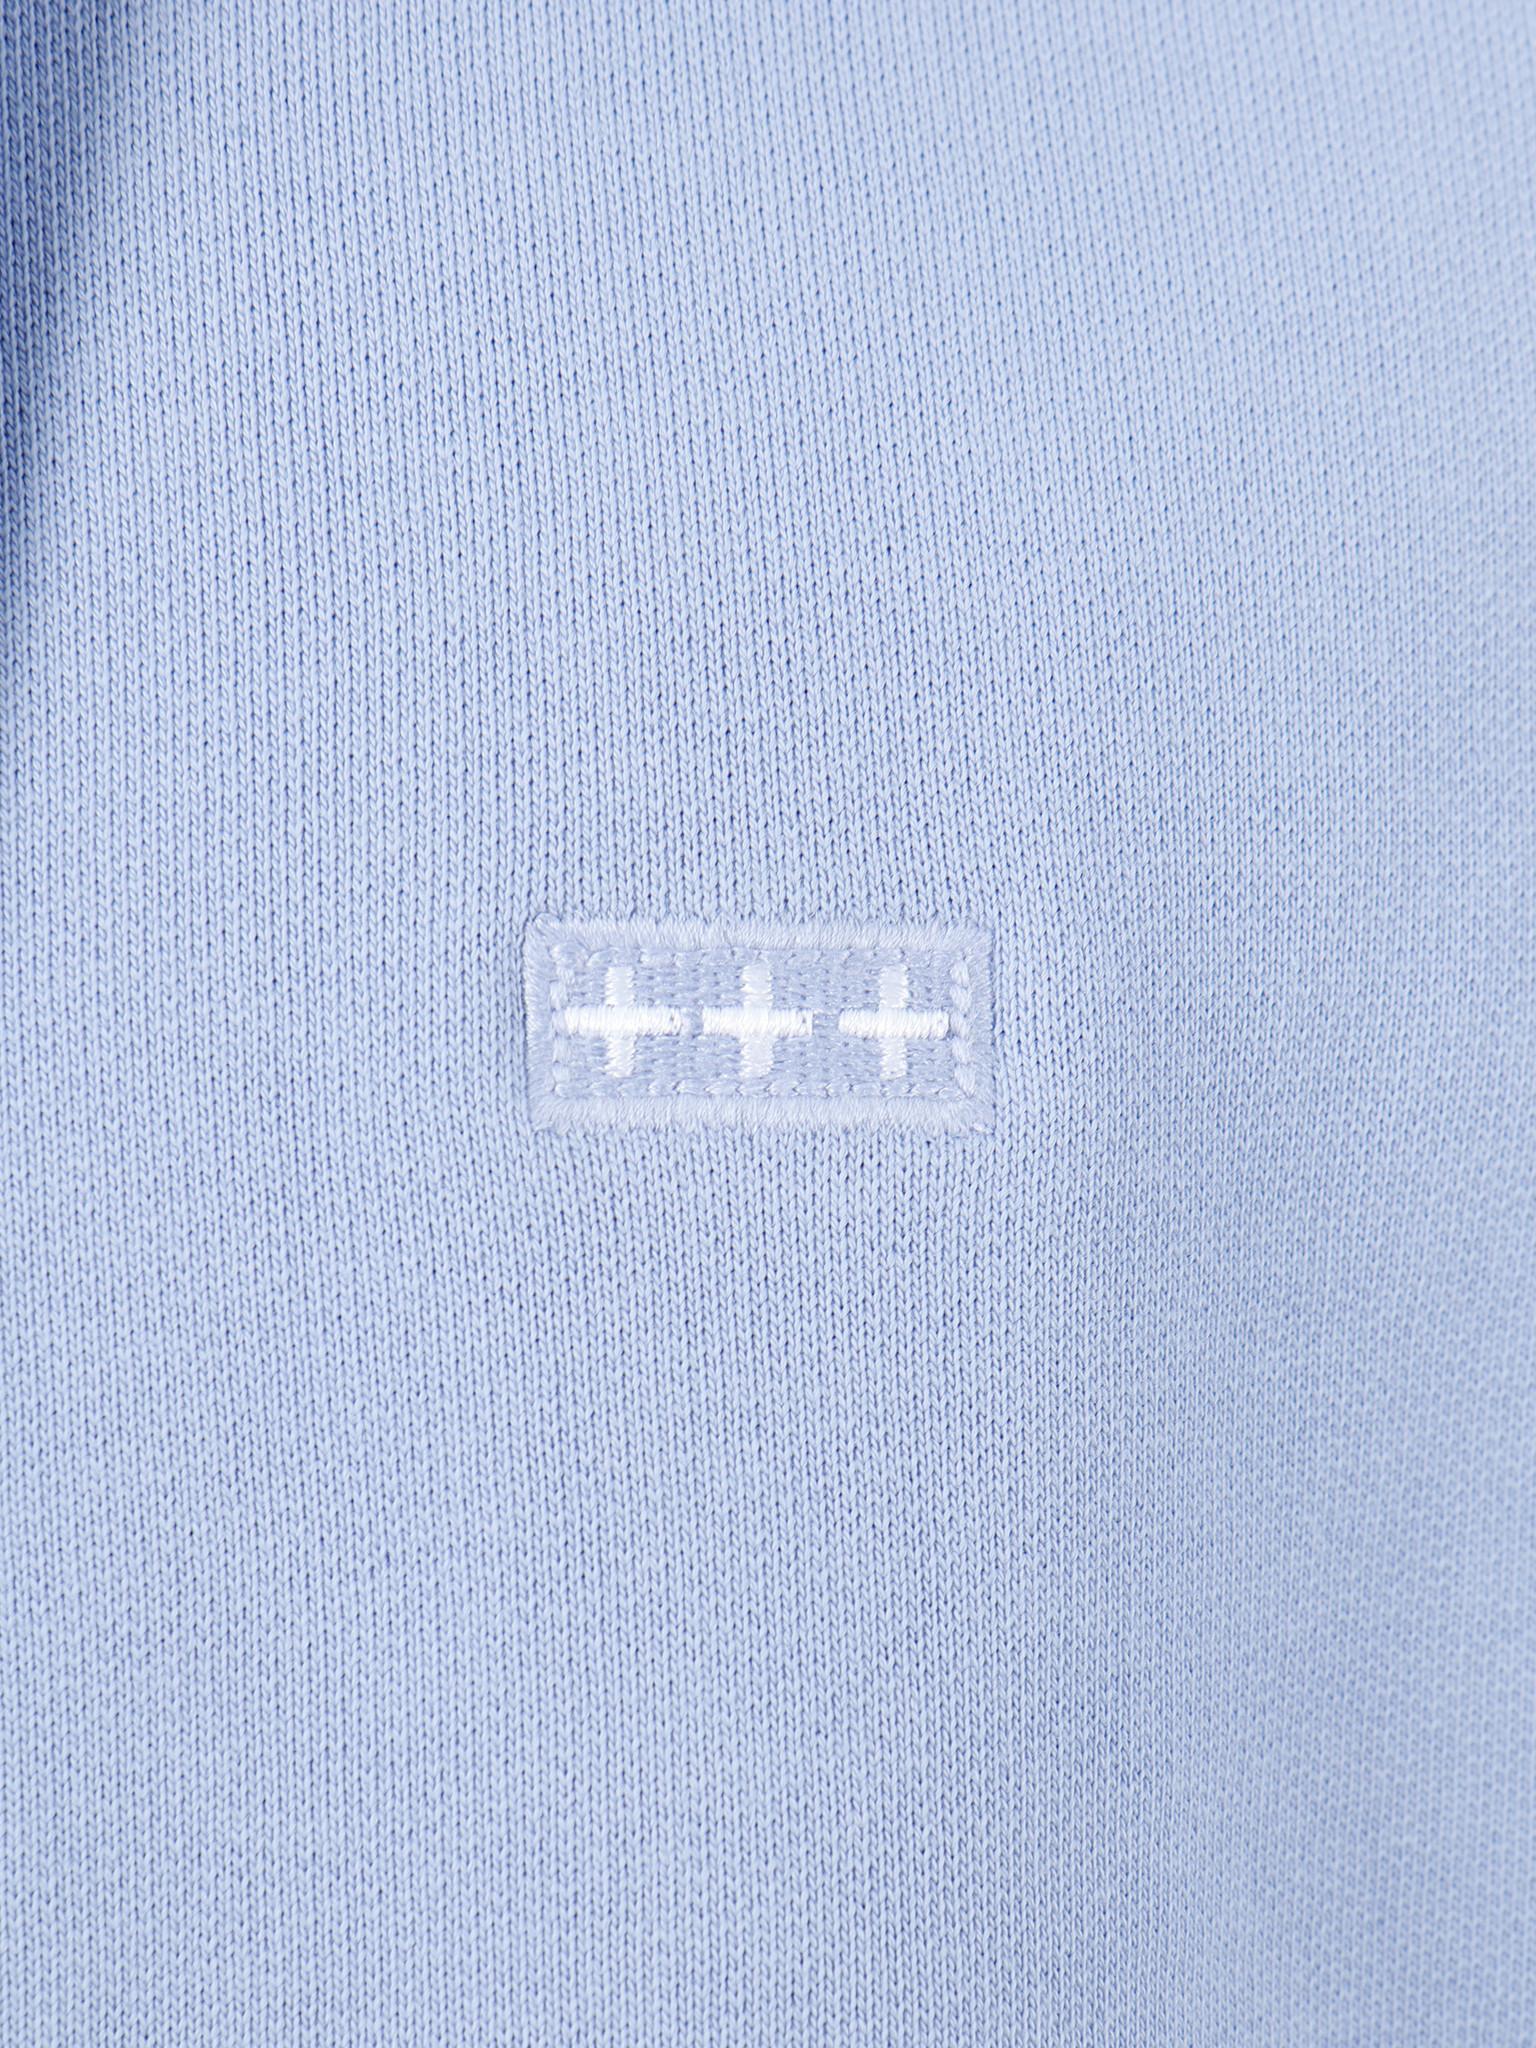 Quality Blanks Quality Blanks QB93 Patch Logo Hoodie Lilac